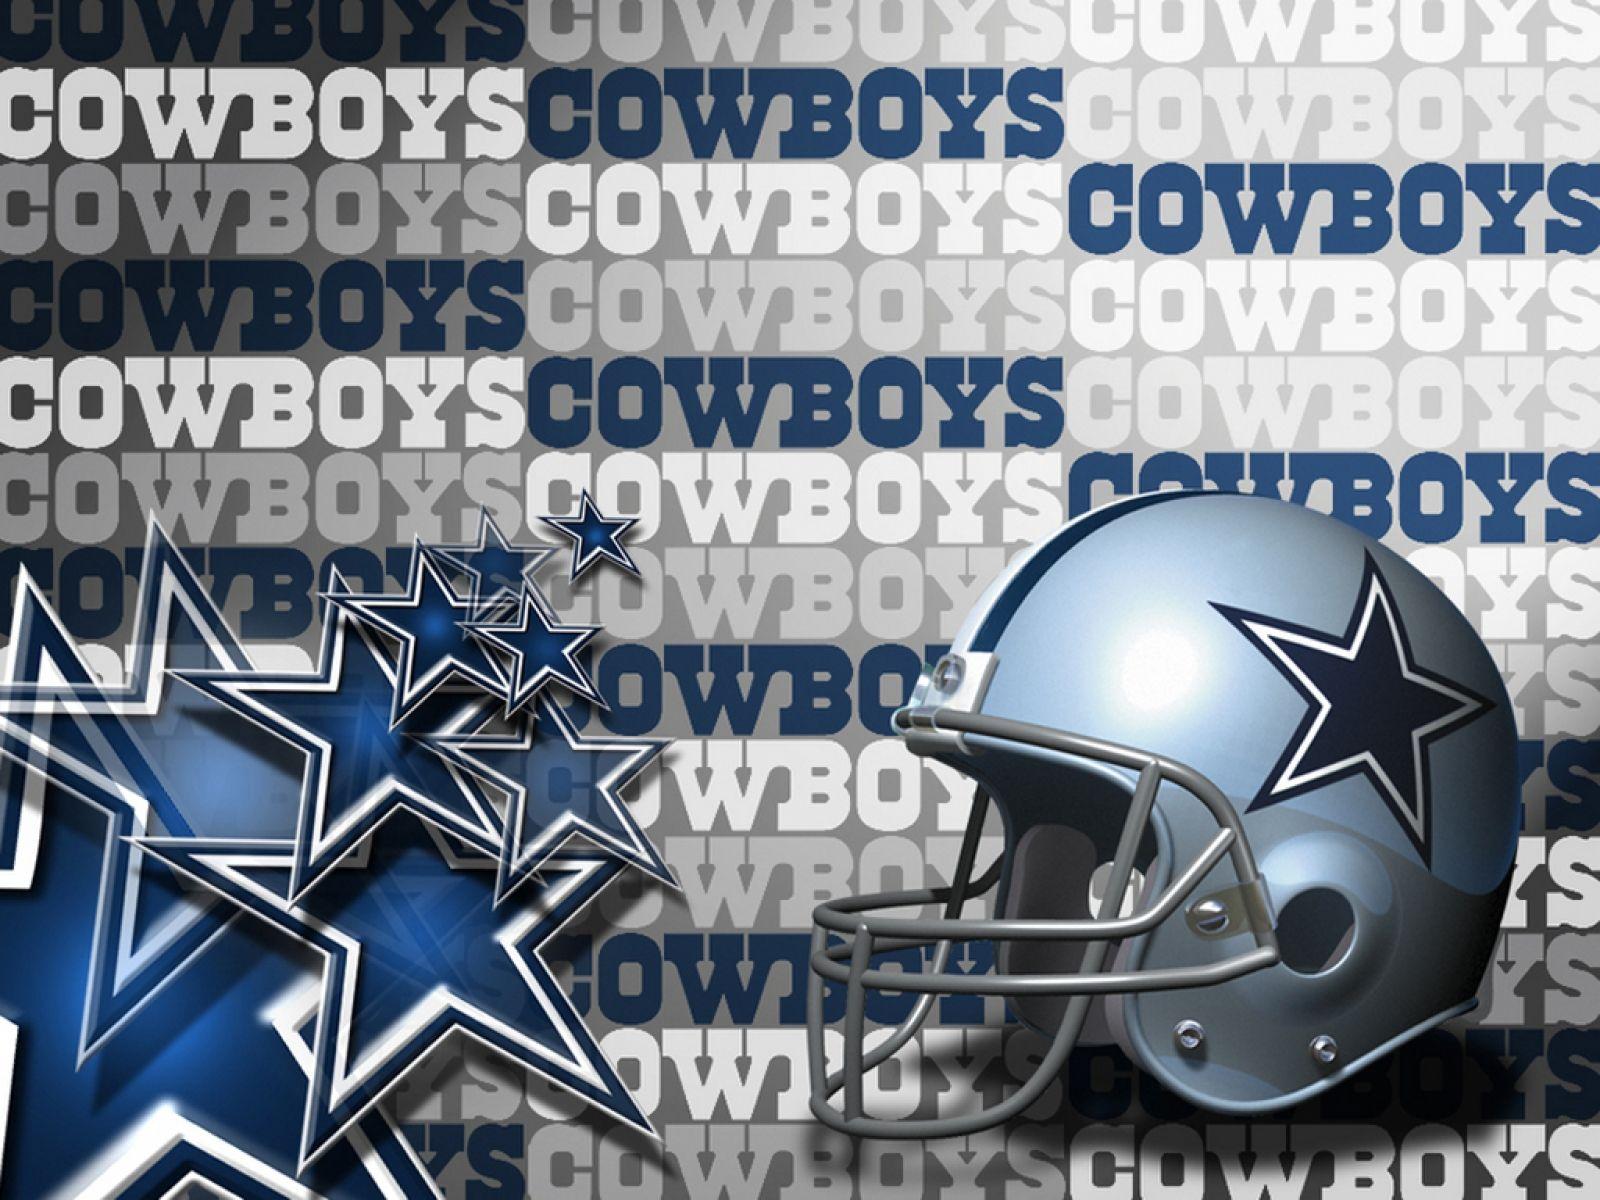 http://4.bp.blogspot.com/-8sFXVLLx3l8/TY4jS5vMWiI/AAAAAAAACS8/chLZvXhlWC4/s1600/Cowboys-helmet-dallas%2Bcowboys%2Bwallpapers.jpg